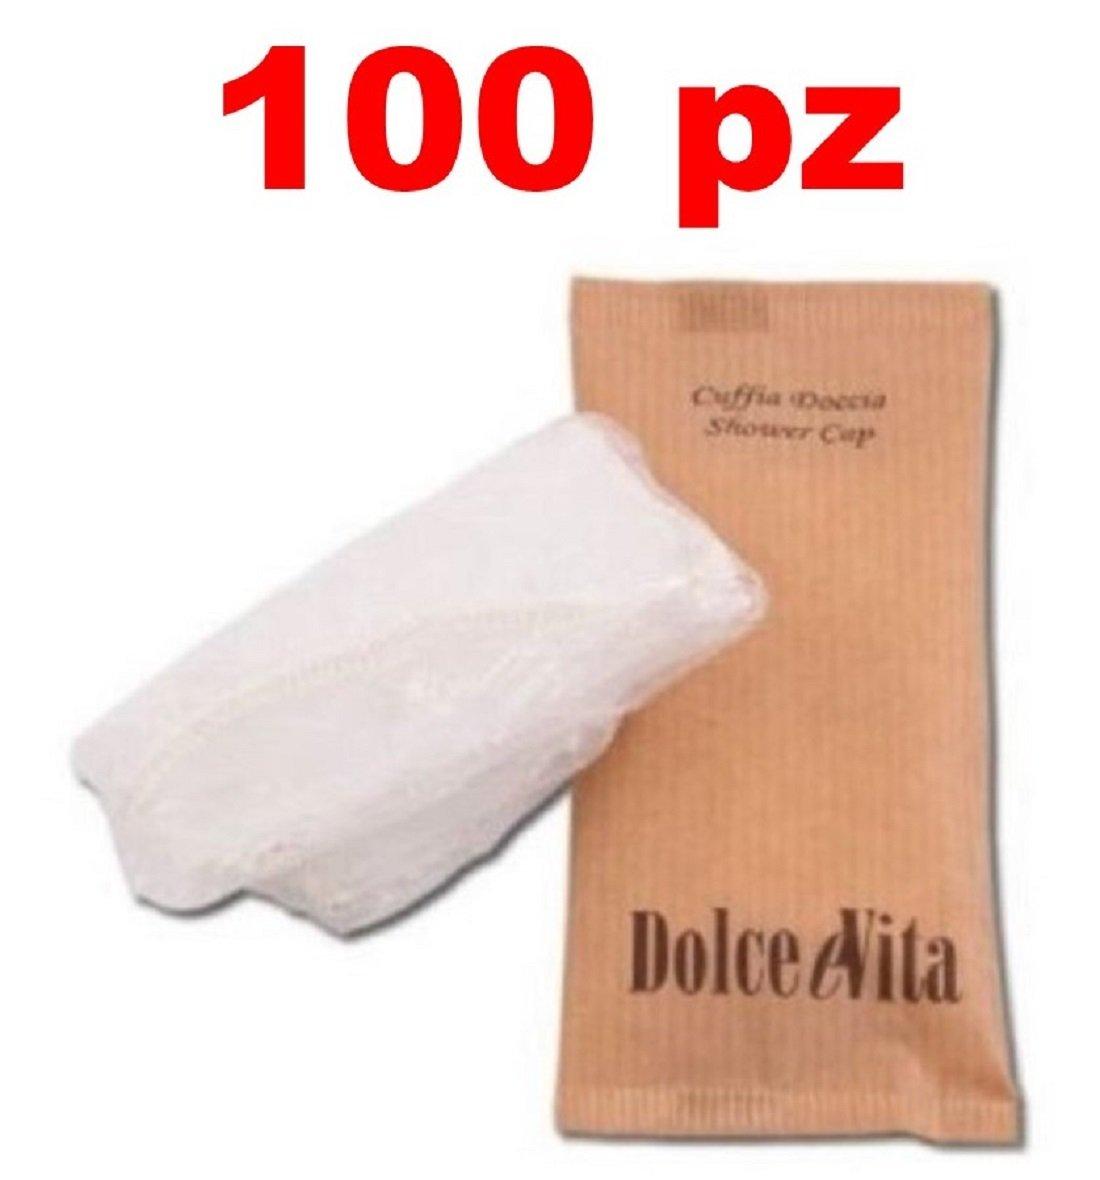 100 pz CUFFIA CUFFIE BAGNO DOCCIA MONOUSO IN CARTA SET CORTESIA ALBERGO B& B DOLCE VITA Menitashop